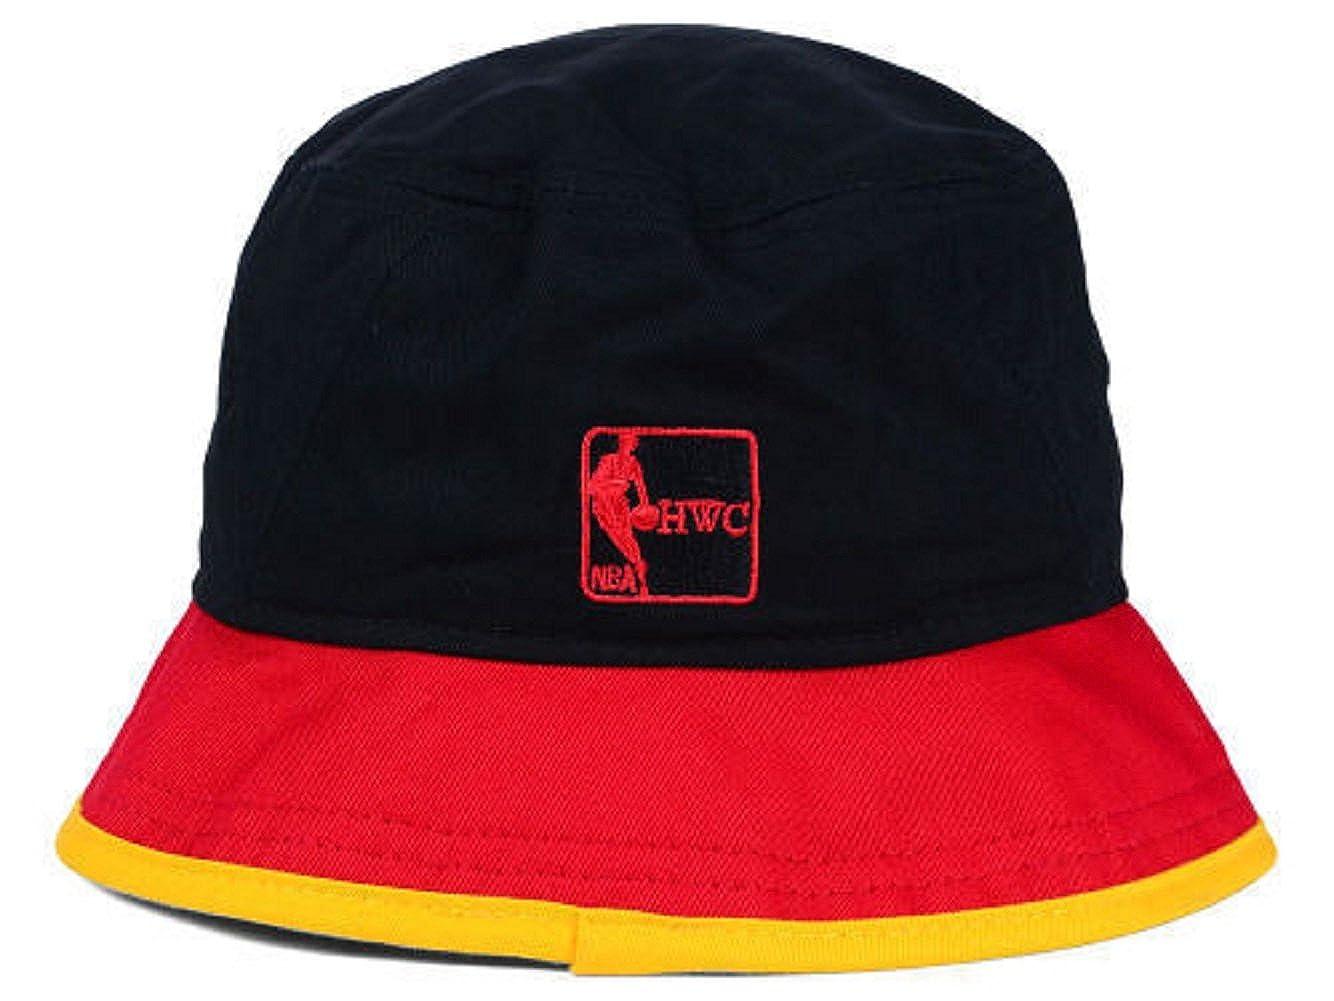 New Era NBA Miami Heat Black Red Top Bucket Hat at Amazon Men s Clothing  store  ba4a83e5f5f